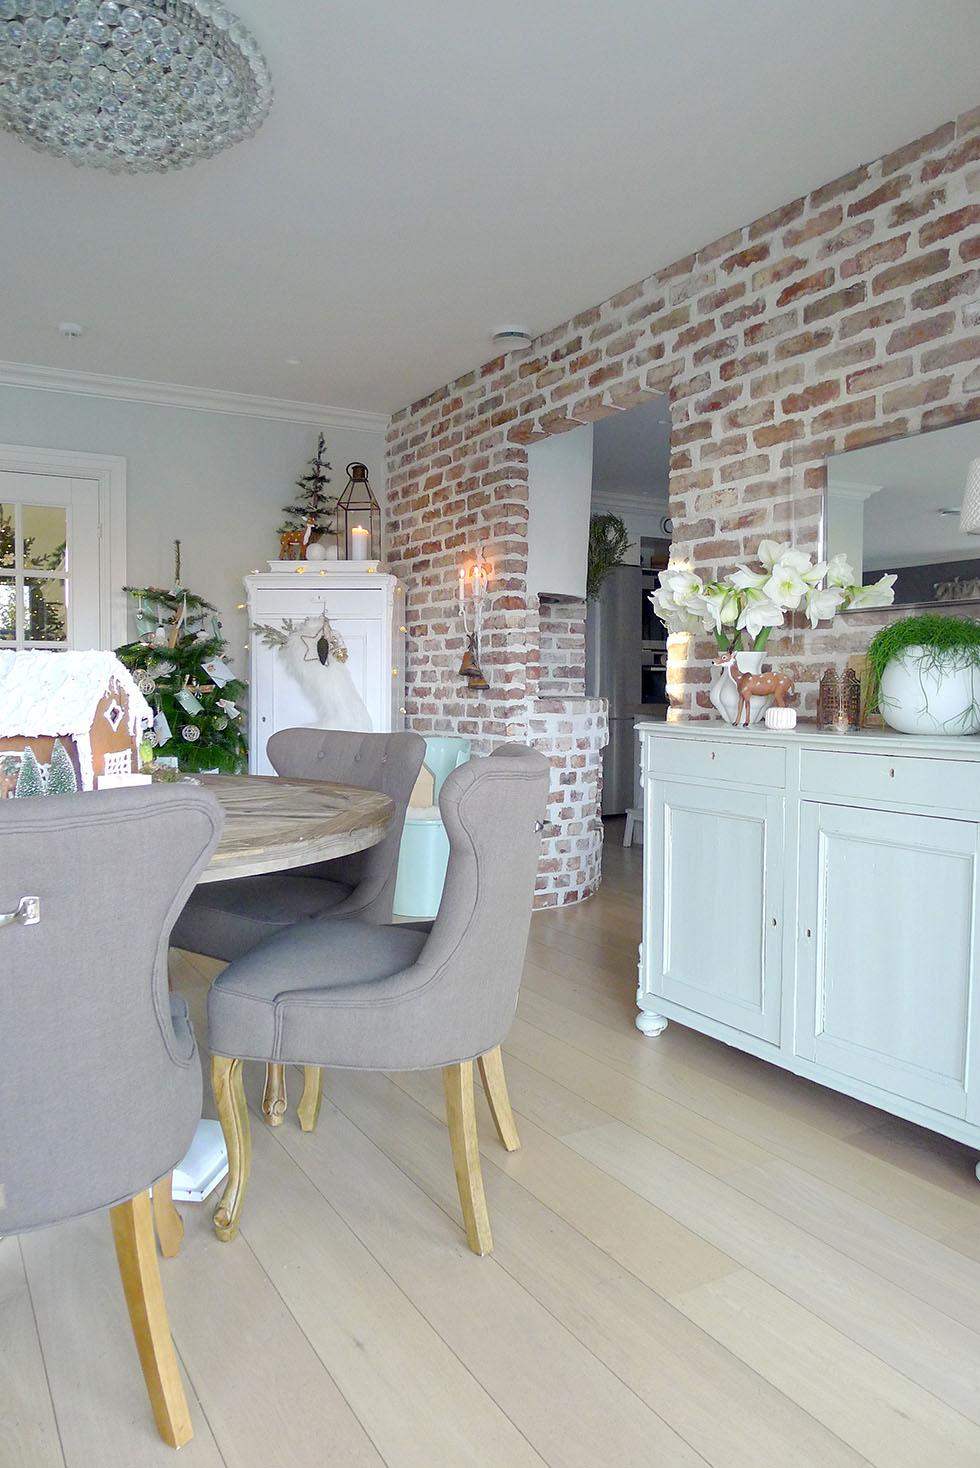 julepyntet stue hos Villa von Krogh